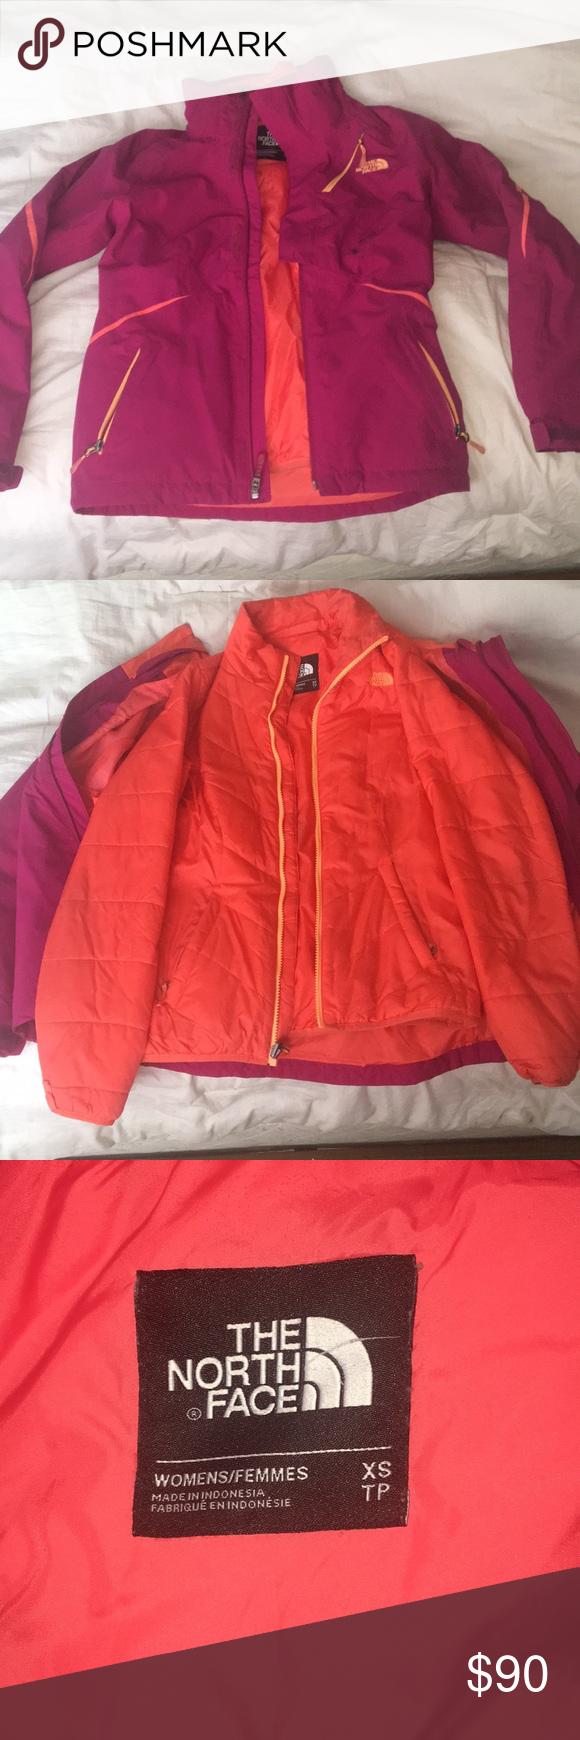 Women S North Face 2 In 1 Ski Jacket North Face Jacket Ski Jacket Light Winter Jackets [ 1740 x 580 Pixel ]